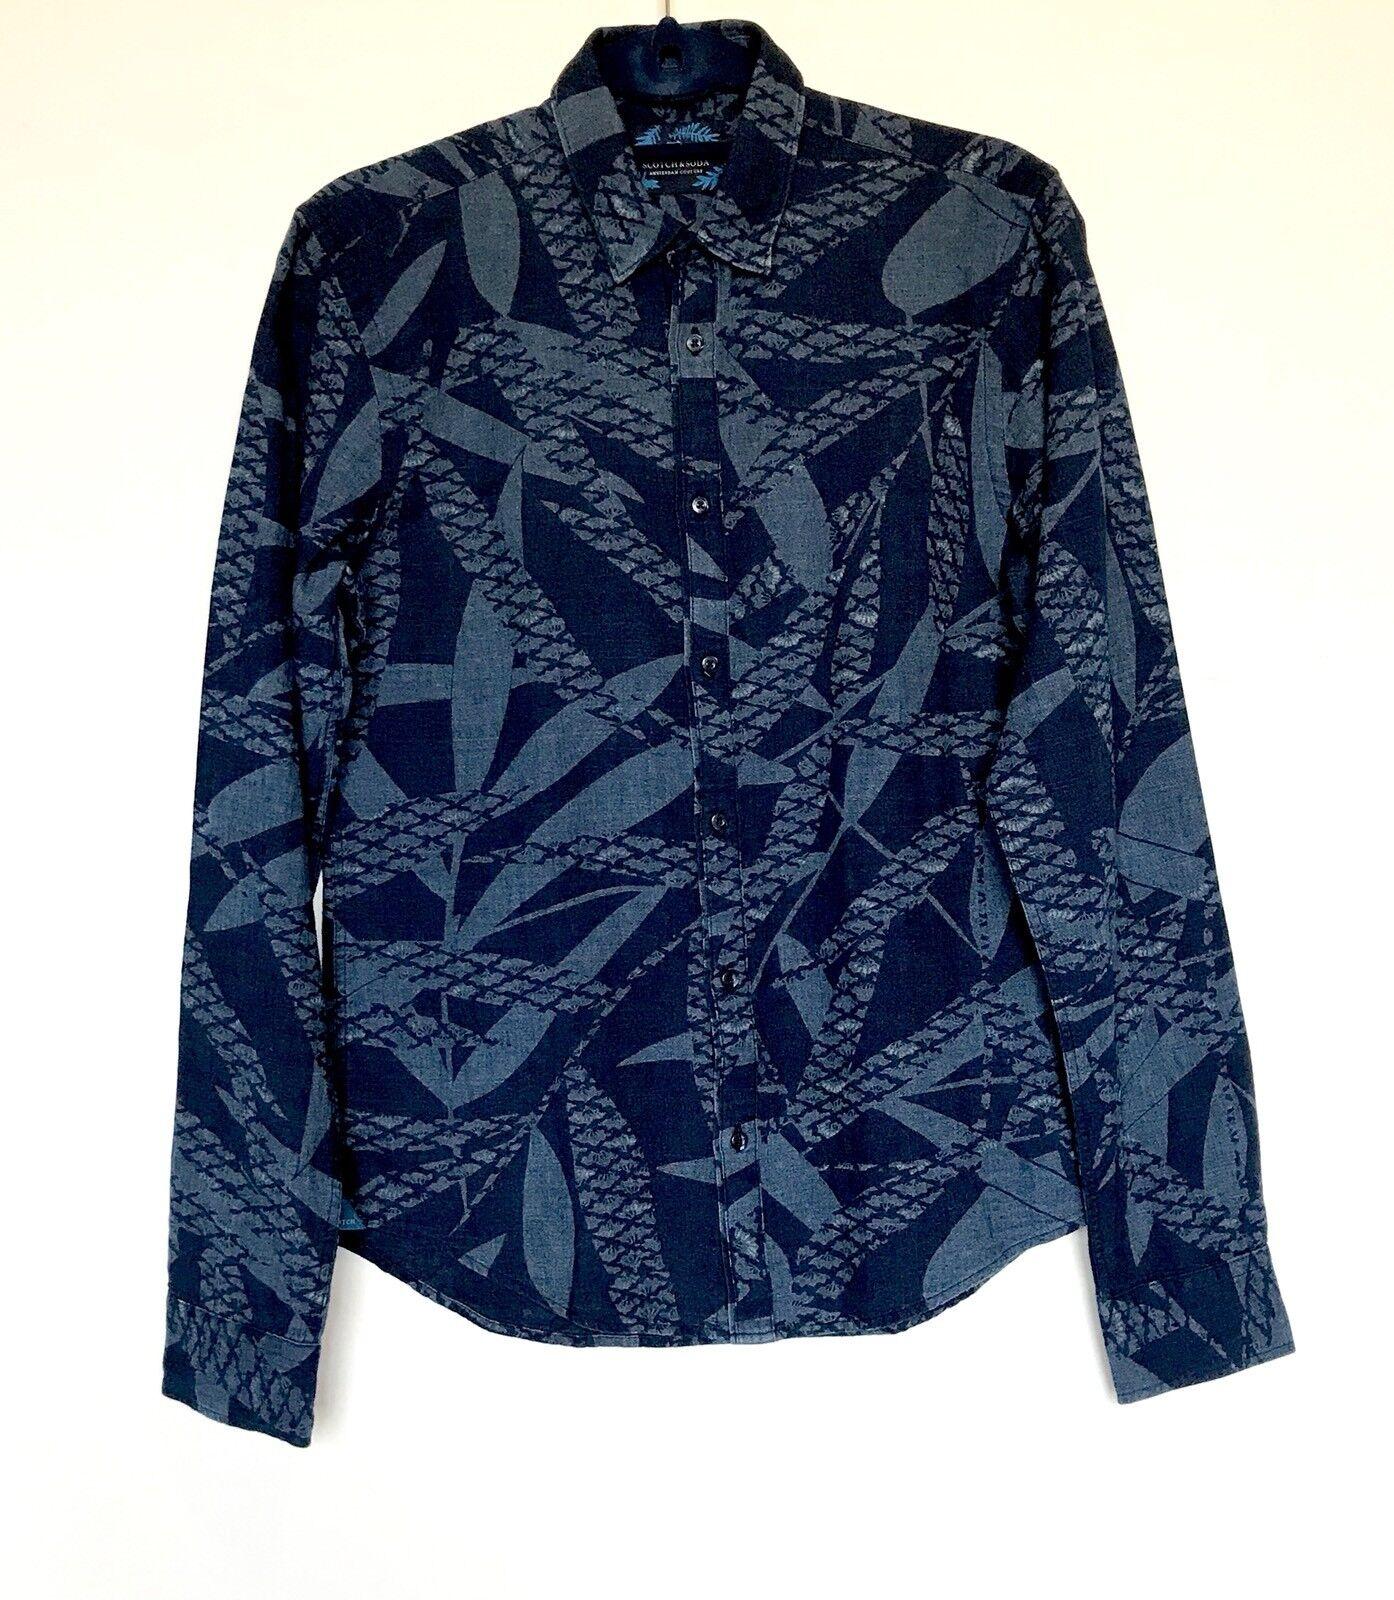 Scotch & Soda bluee Linen   Cotton Mix Shirt. NWT Large Retail  Price